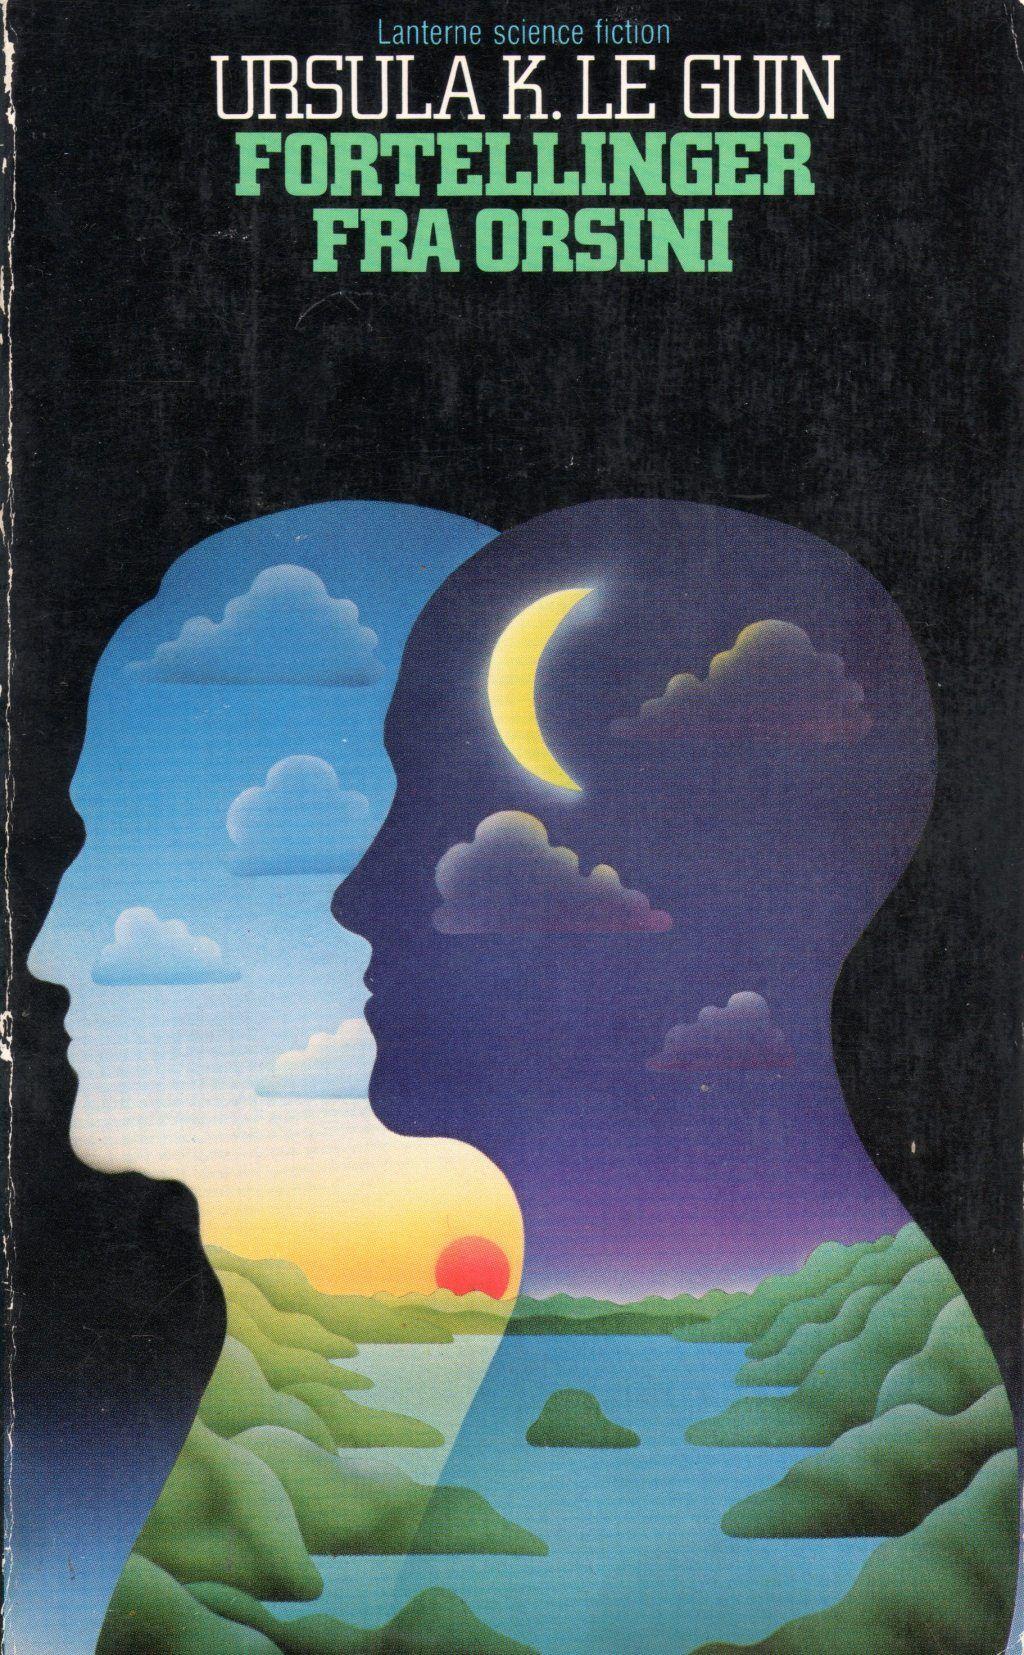 Amazing psychedelic vintage norwegian sci fi book covers sci fi amazing psychedelic vintage norwegian sci fi book covers by flavorwire fandeluxe Gallery